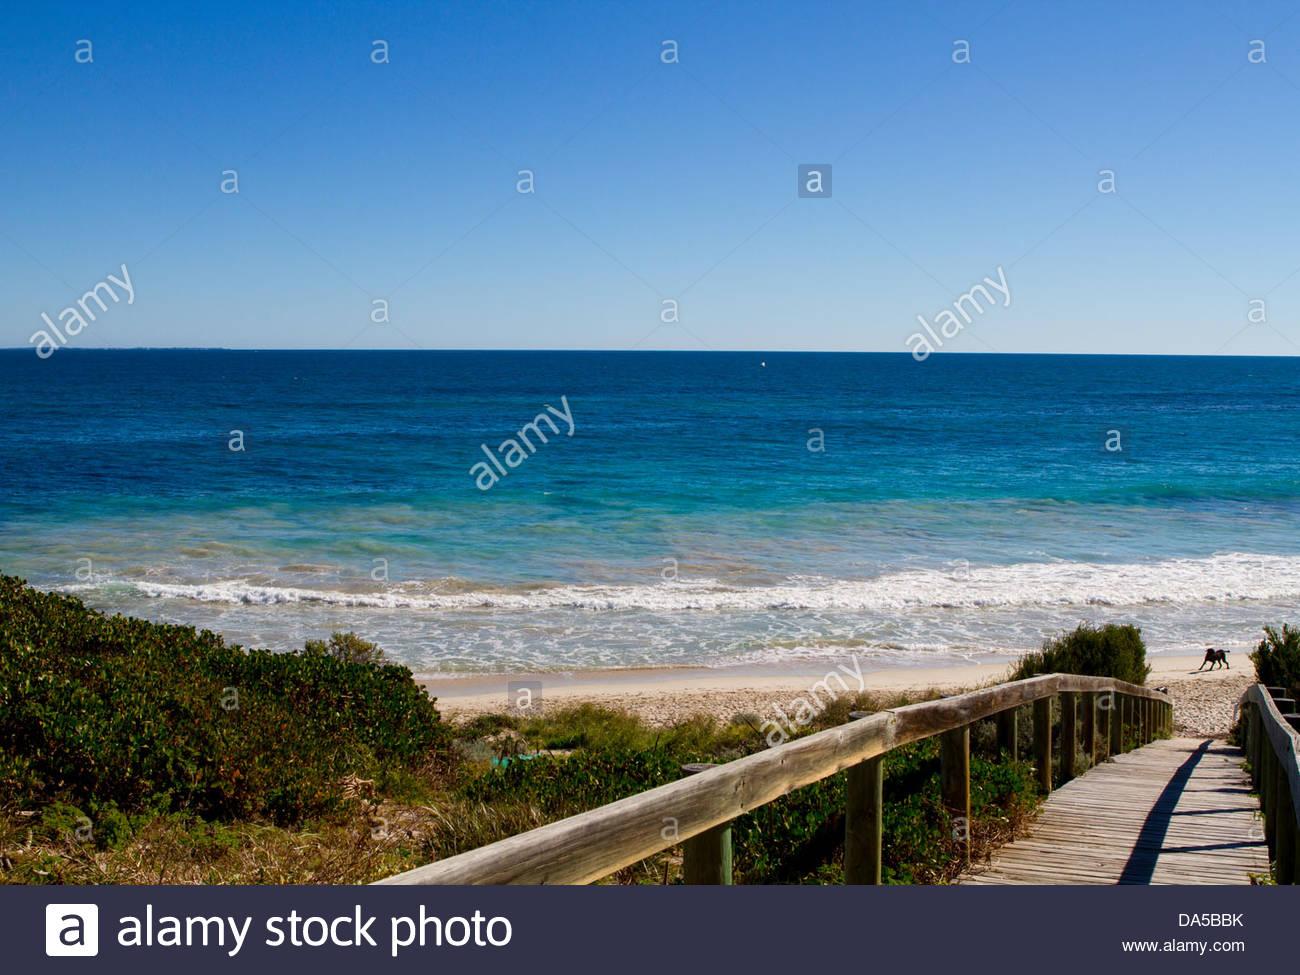 beach view - Stock Image